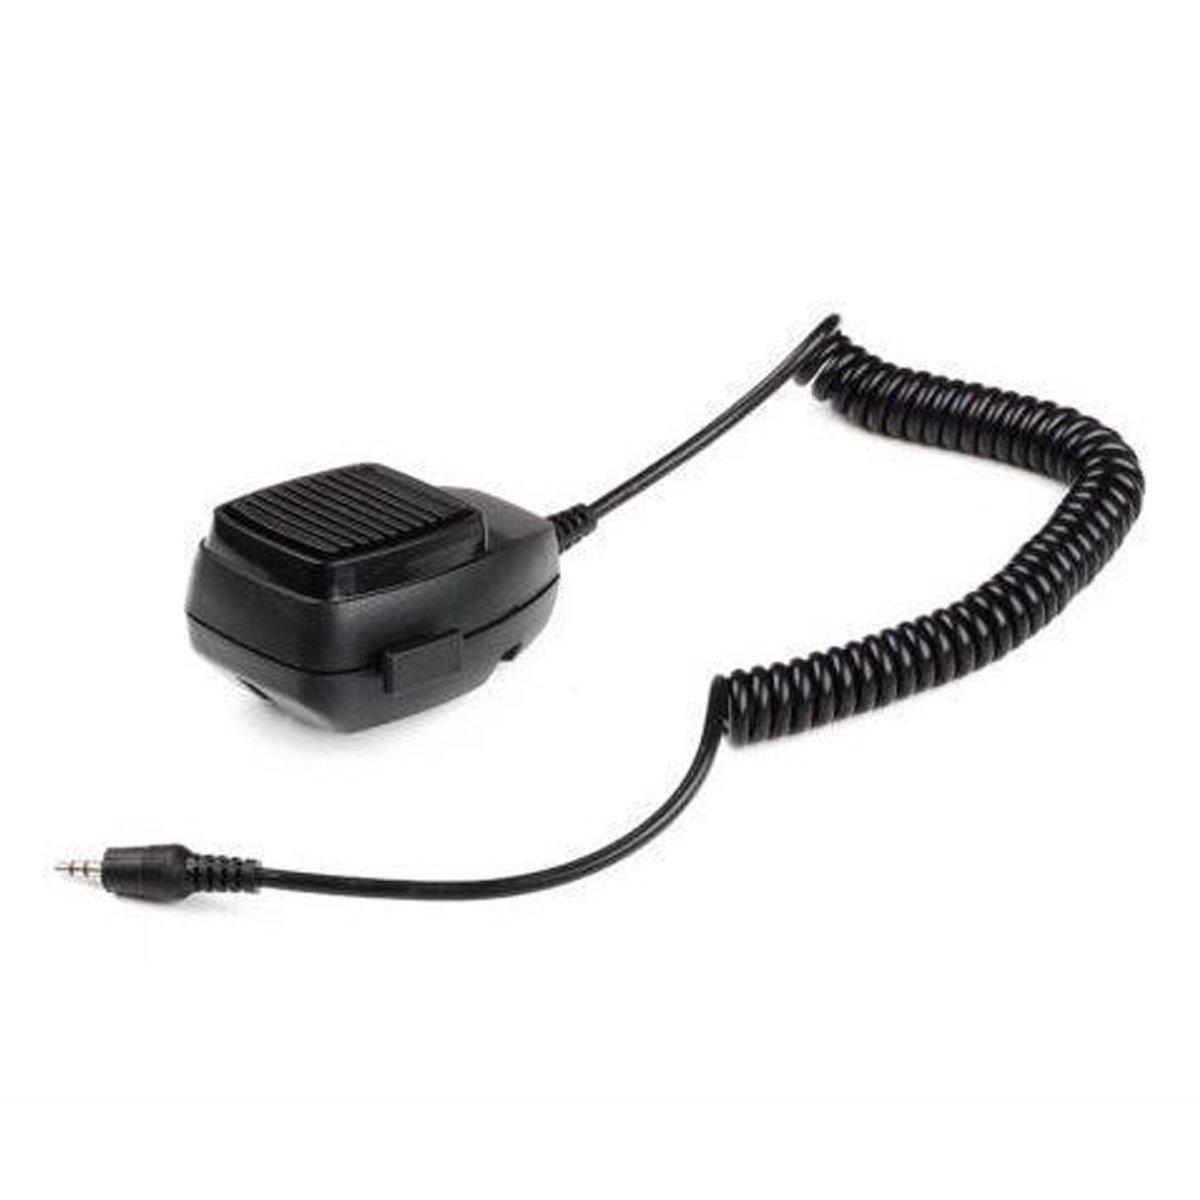 DENG 200W 8Sound Loud Car Warning Alarm Police Fire Siren Horn PA Speaker CJB by DENG (Image #4)